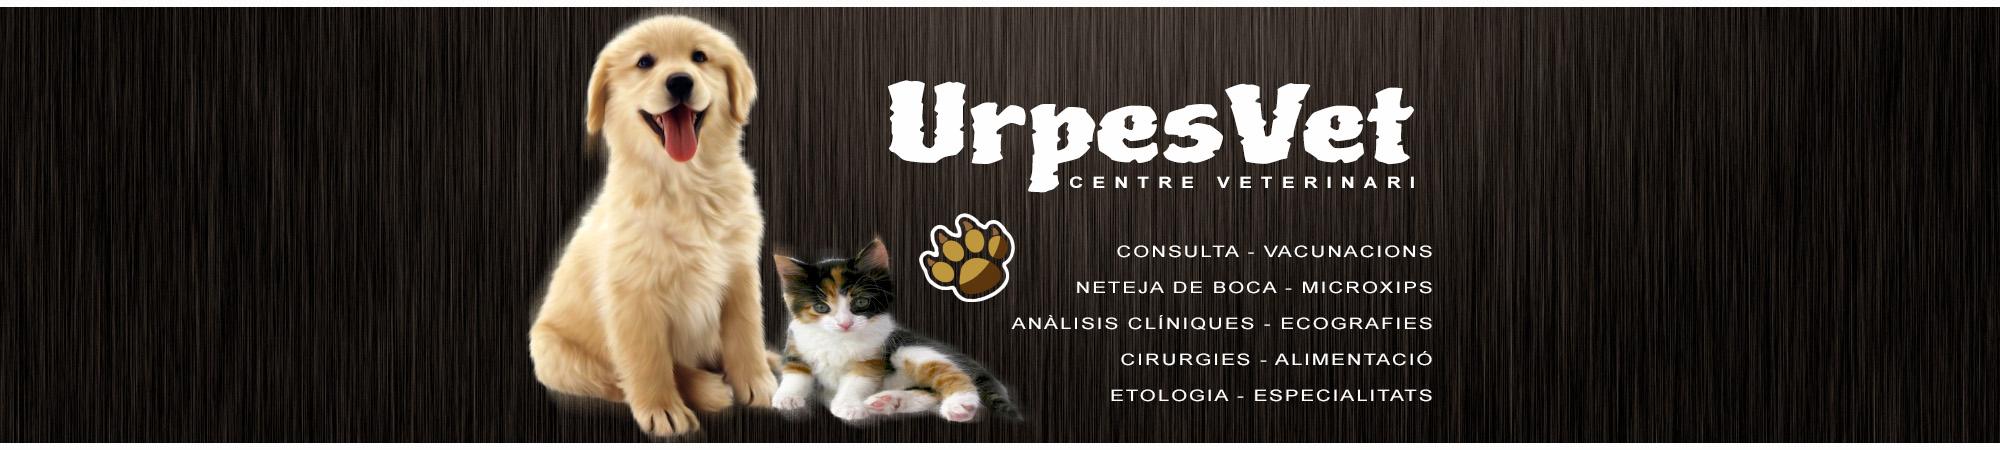 Centro veterinario Baix Llobregat, Centro veterinario veterinari Sant Joan Despí